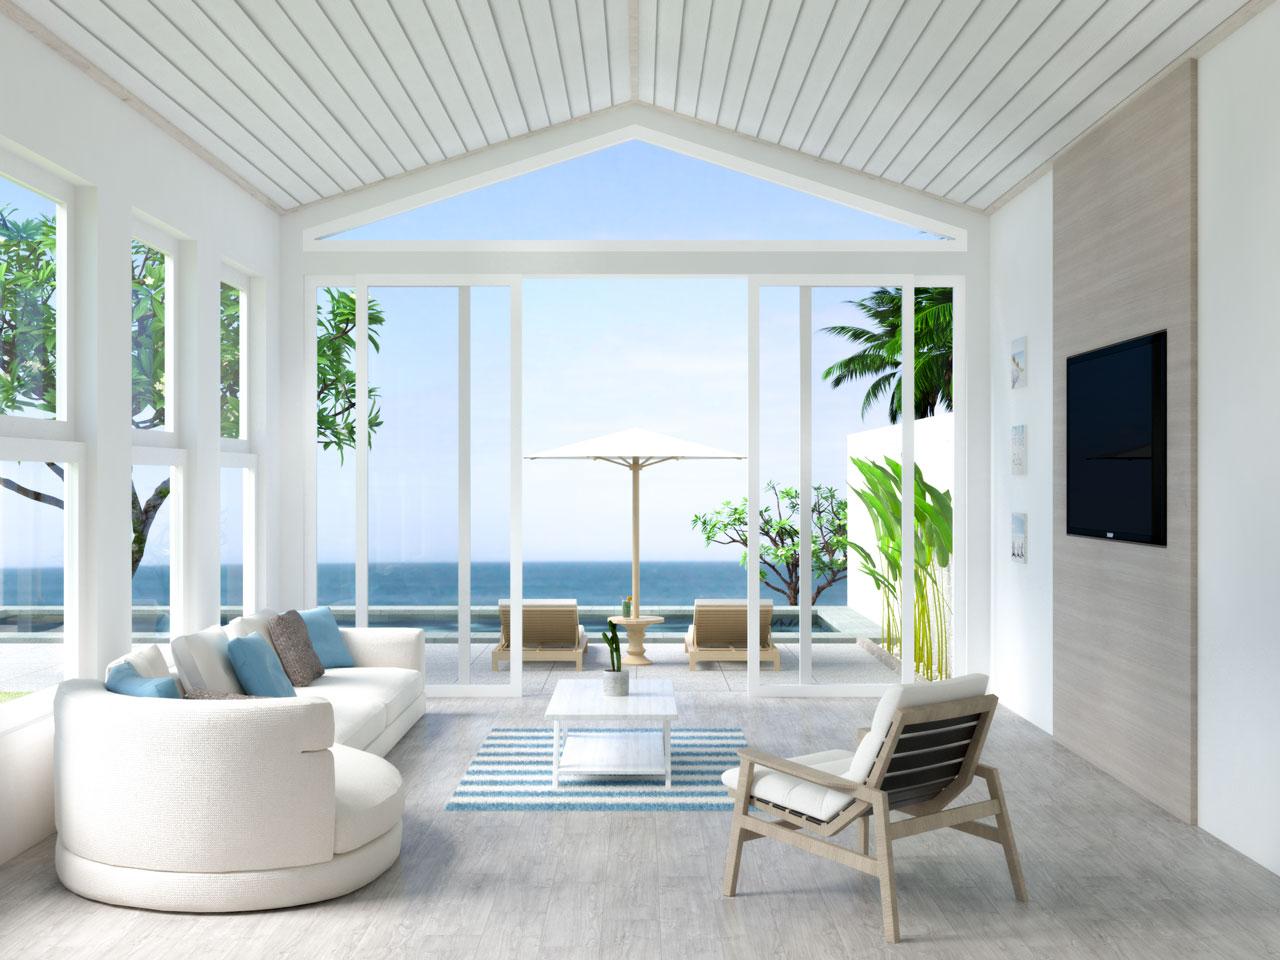 Beach house living room with beige flooring